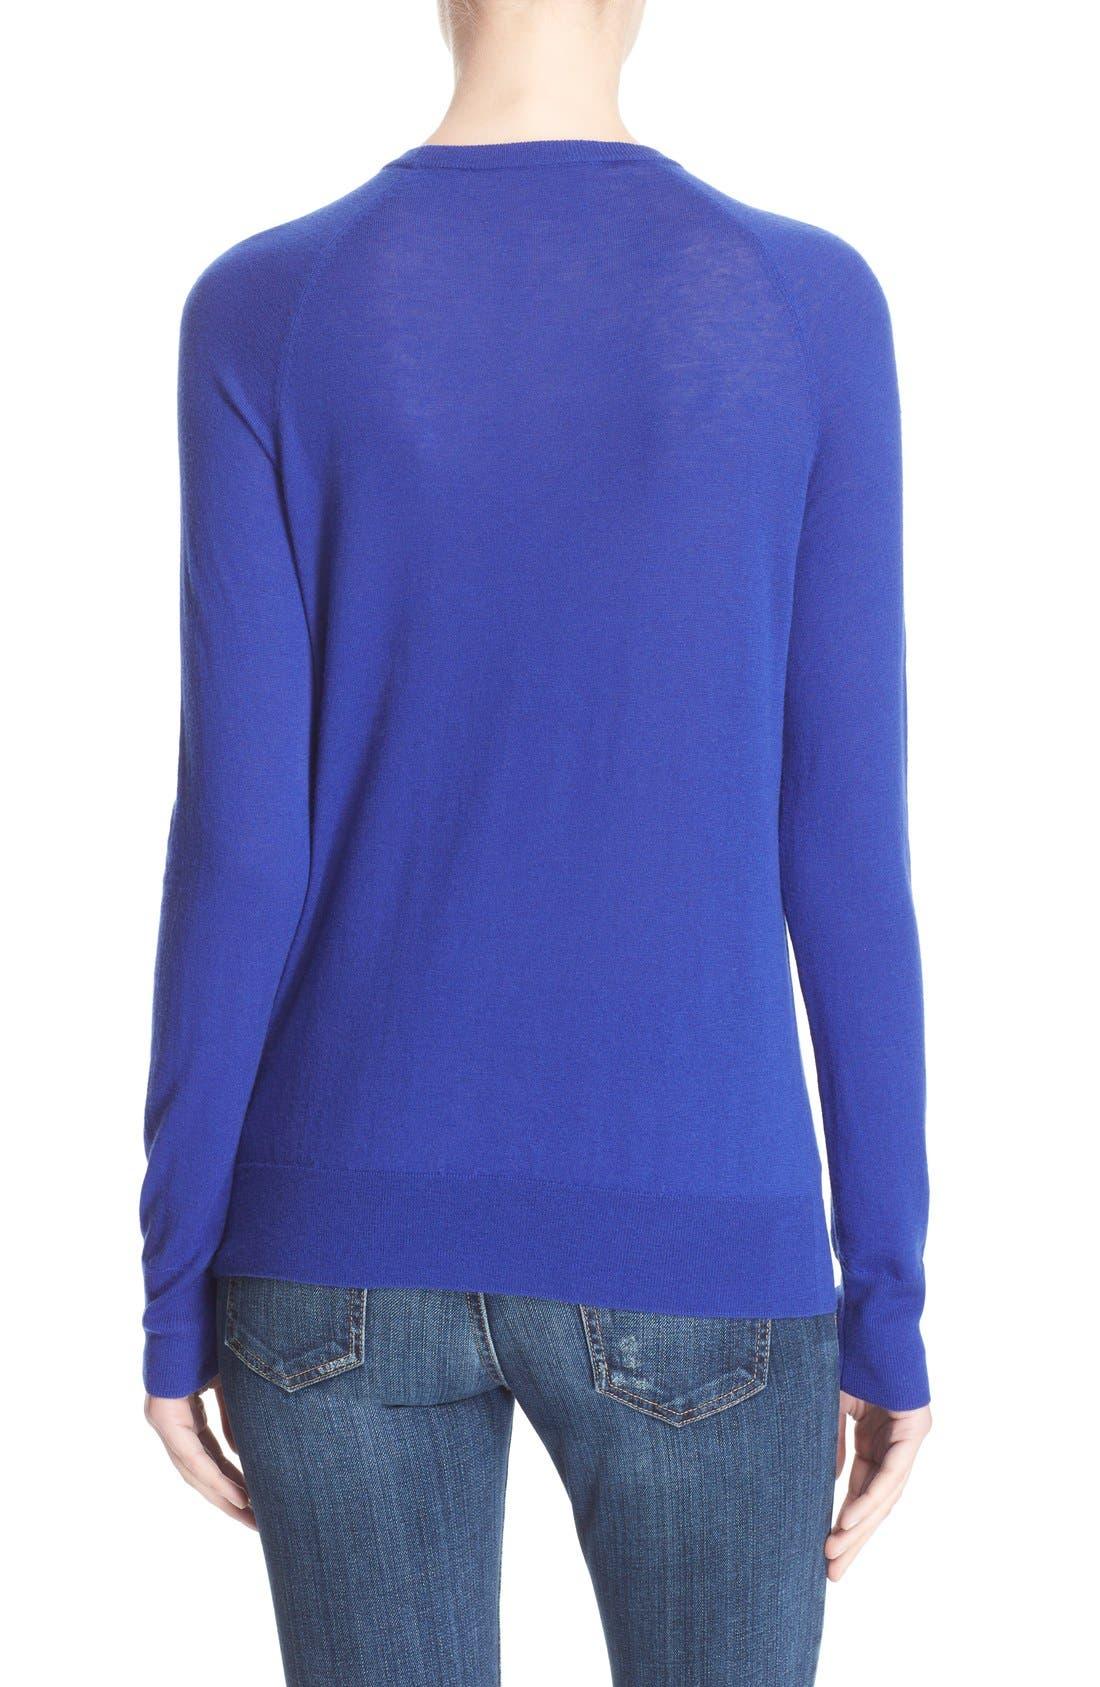 Alternate Image 2  - Equipment 'Sloane' Crewneck Sweater